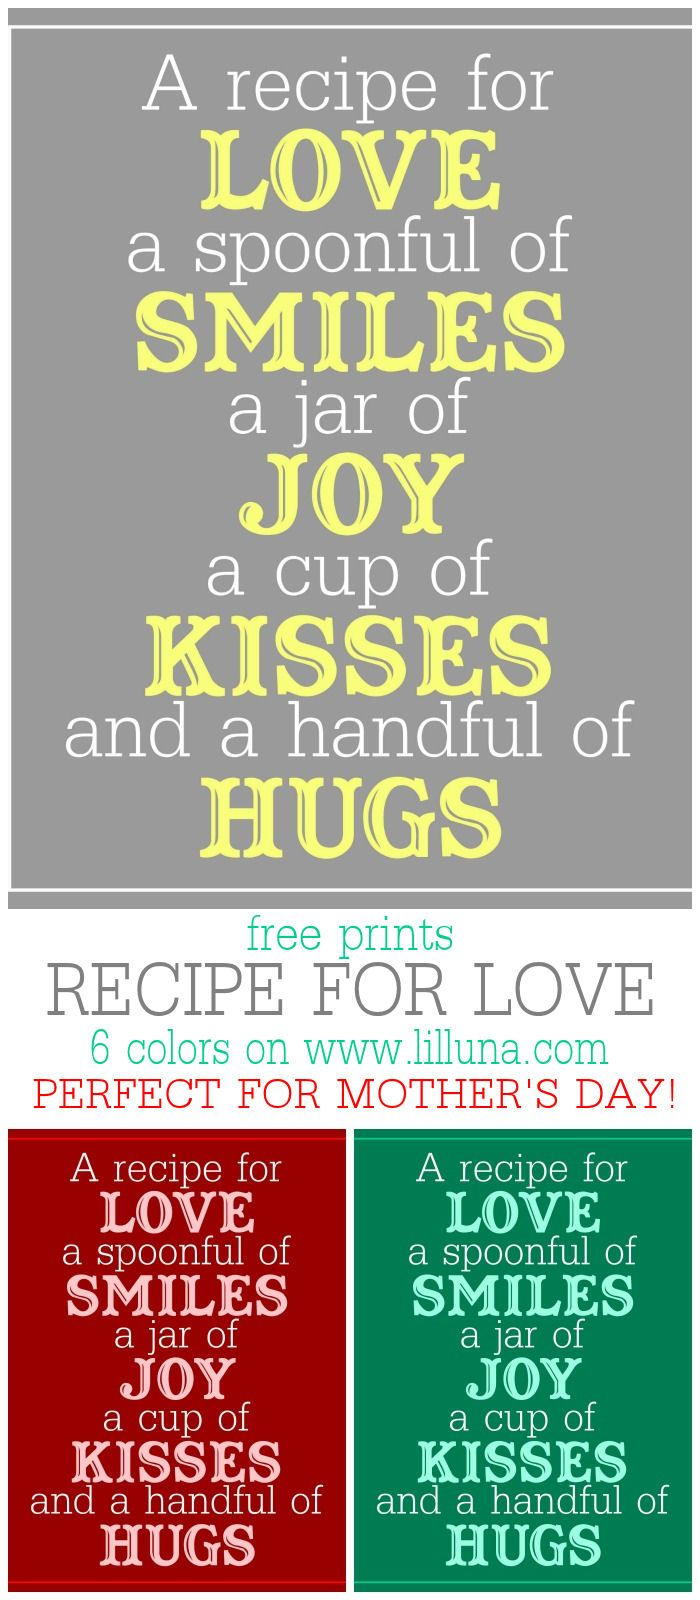 Recipe for Love Mother's Day Print - 6 FREE color prints on { lilluna.com }